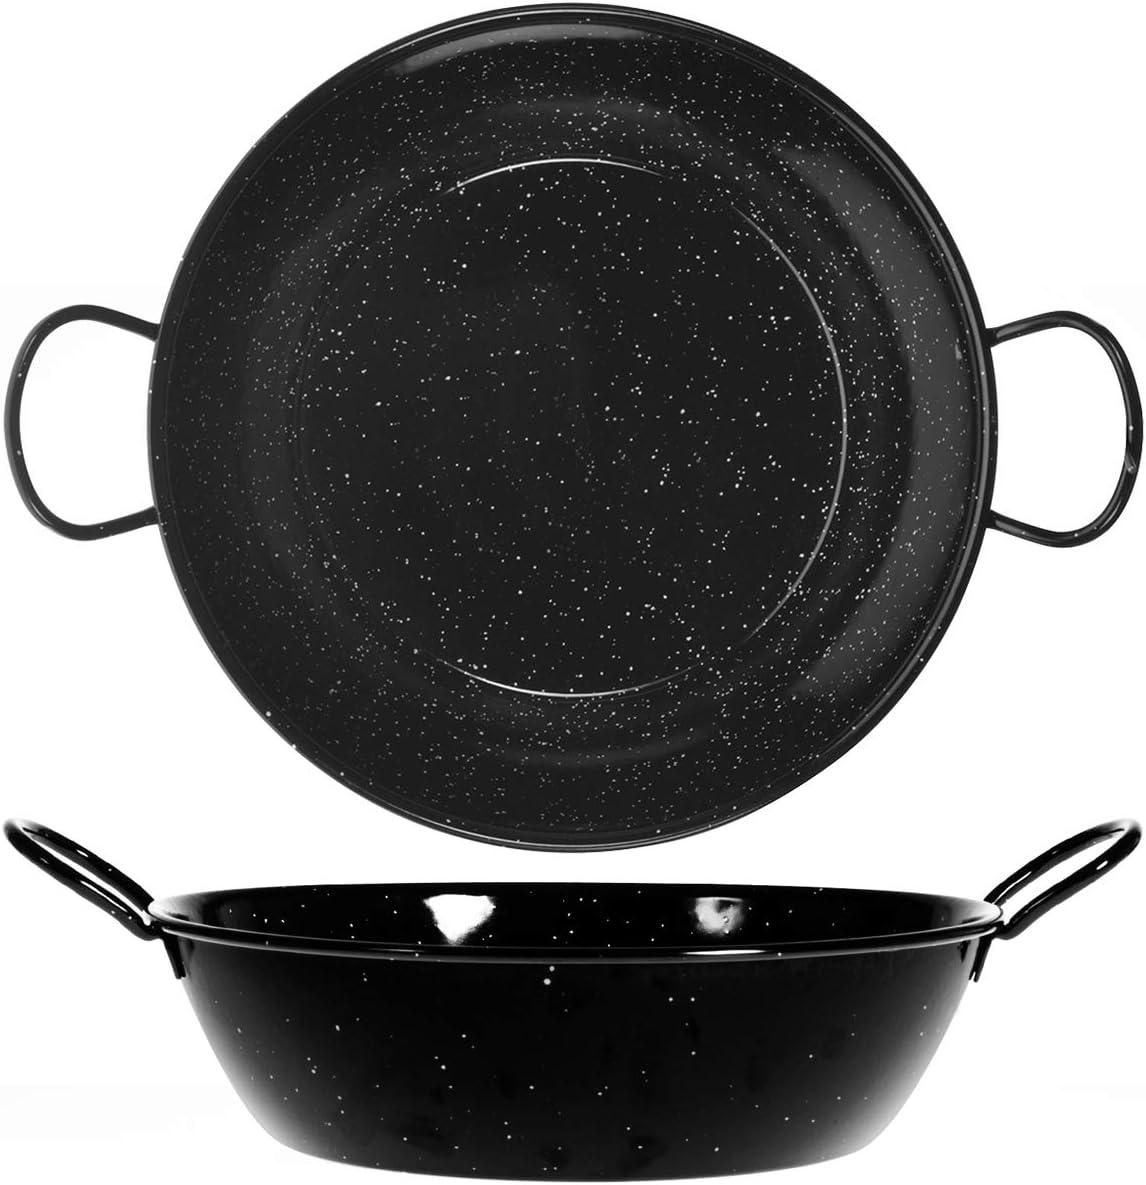 Vaello La Valenciana Honda Chimney Panel Enamelled Steel Sling Pan Black 20 cm